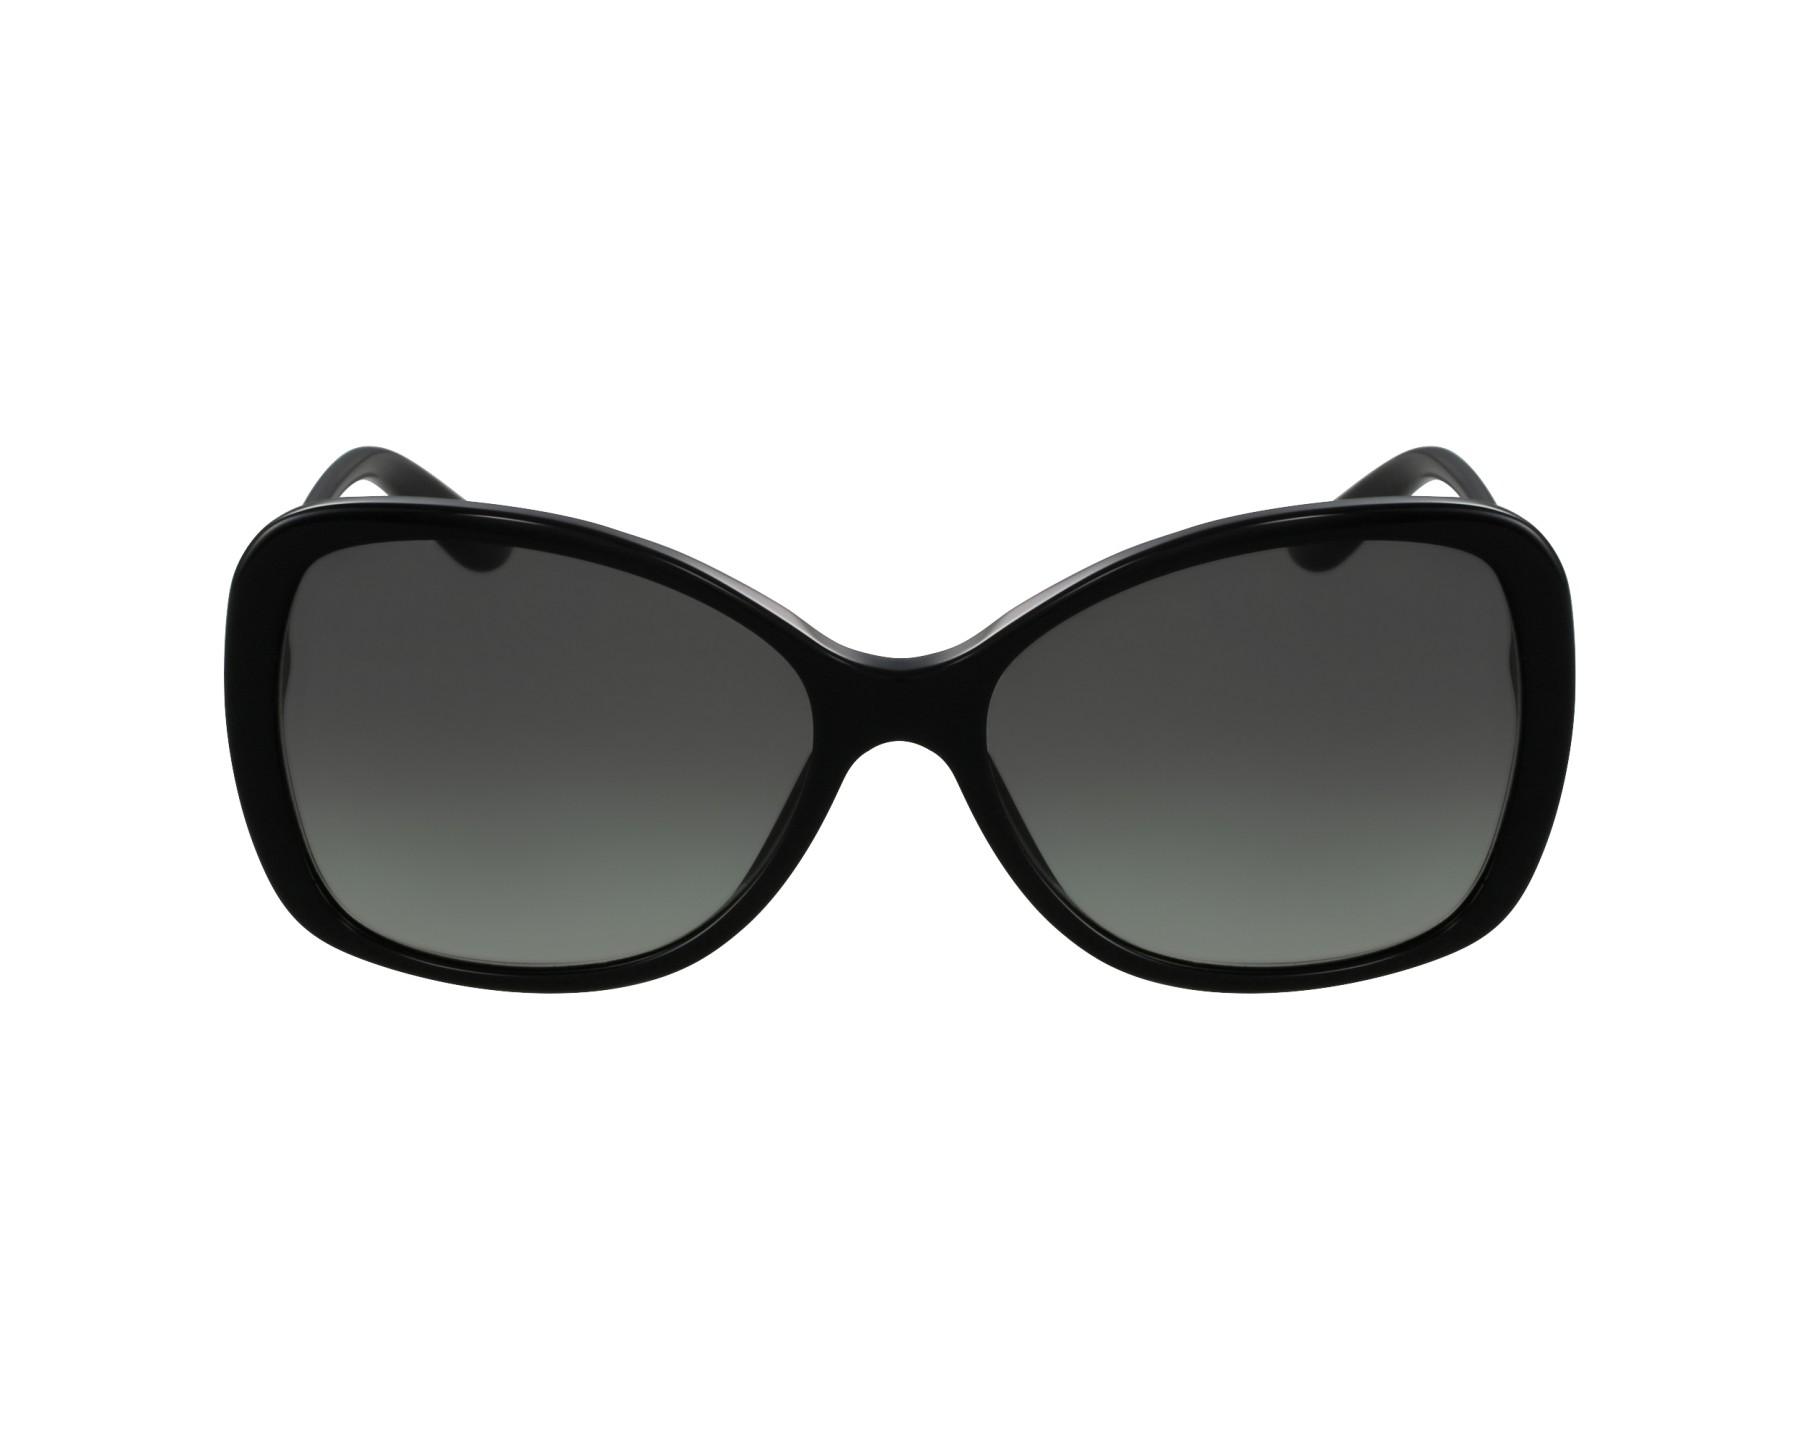 4fd949ce70 Sunglasses Versace VE-4303 GB1 11 - Black Gold profile view